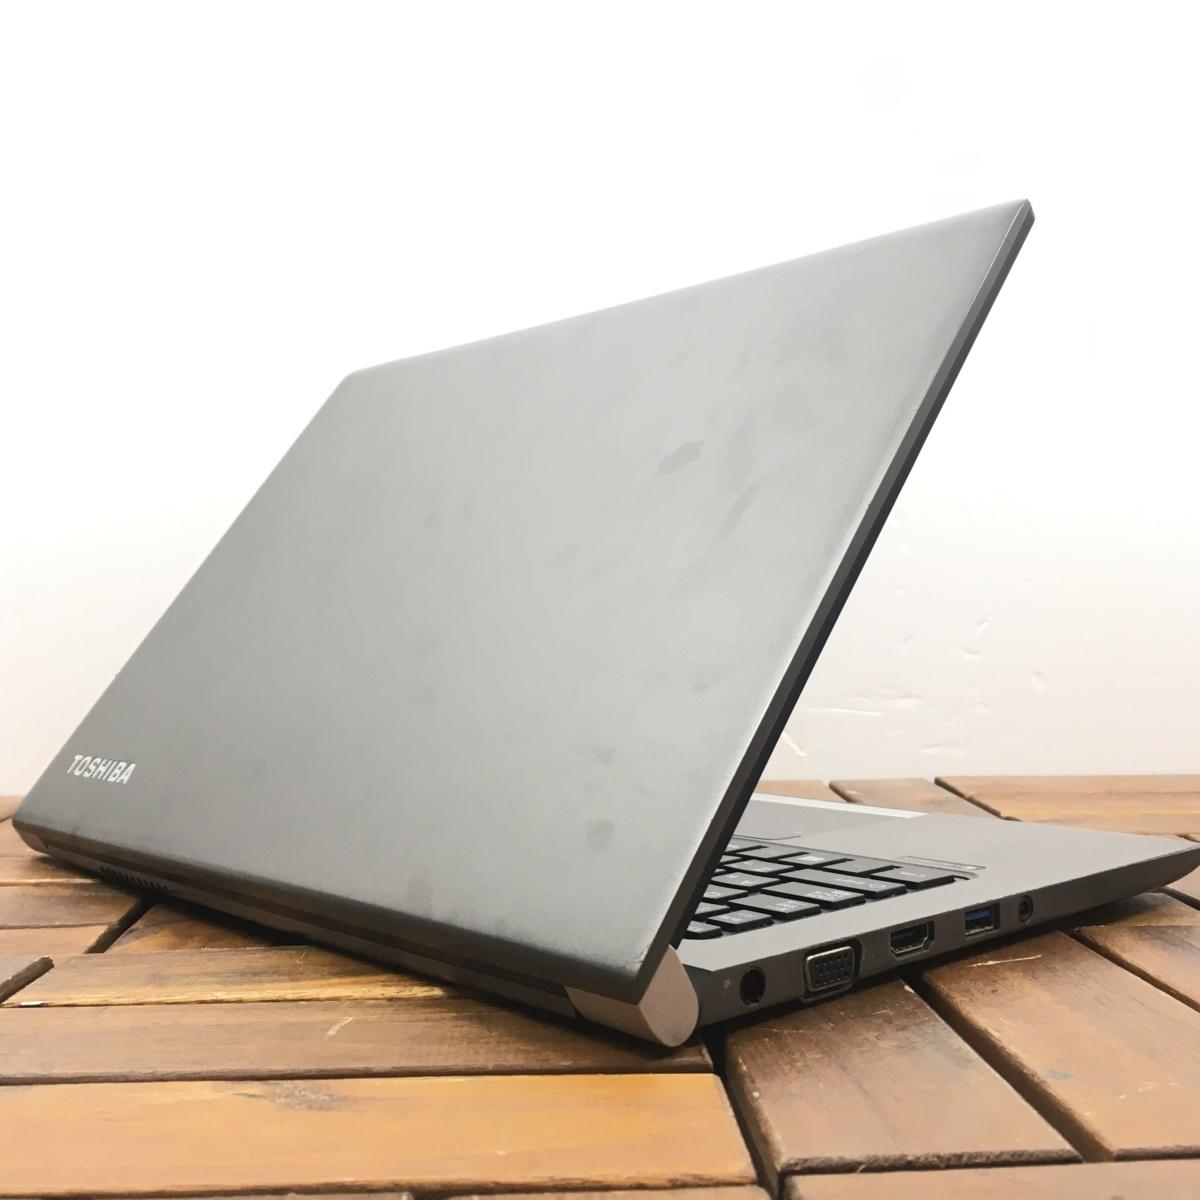 Windows10/office搭載/Webカメラ搭載!ビデオ通話対応【TOSHIBA 東芝/dynabook R634/L】Core i5-4200U/メモリ8GB/SSD128GB_画像5